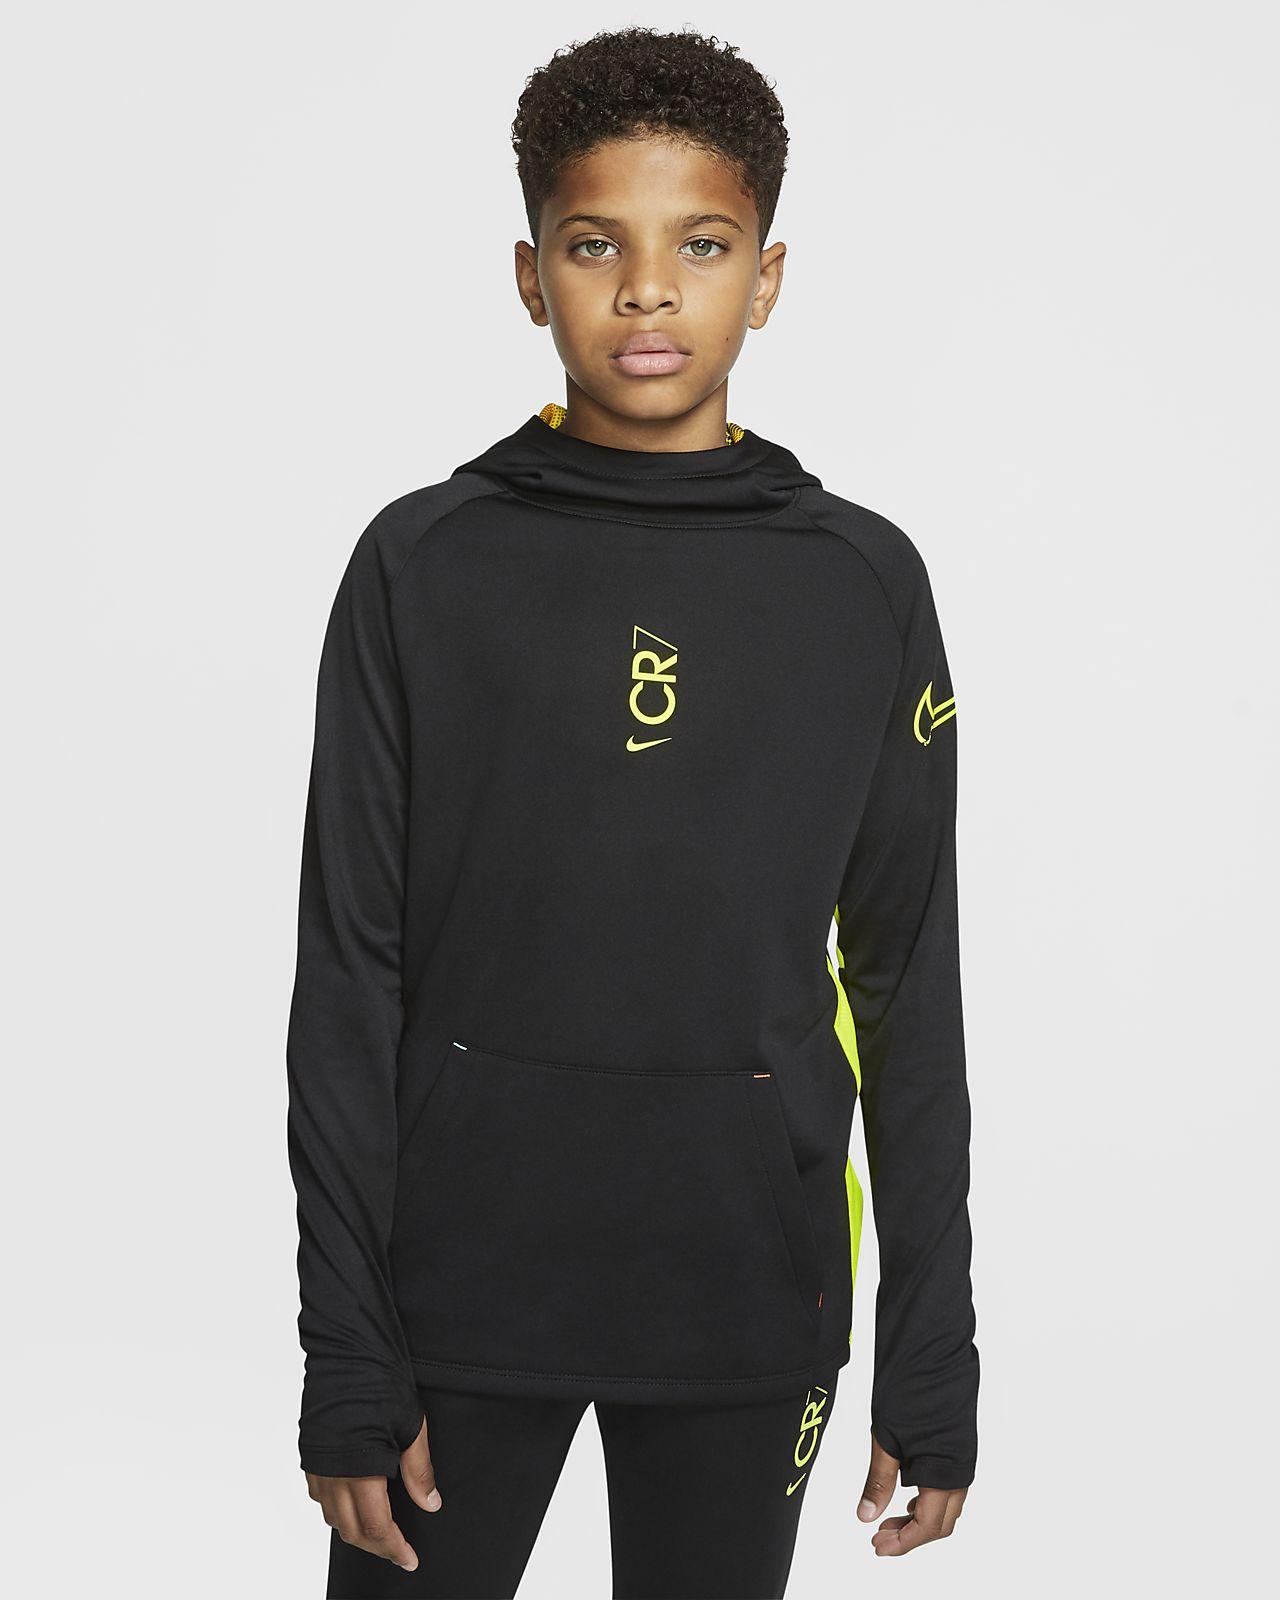 Nike Dri-FIT CR7 Fußball-Hoodie für ältere Kinder